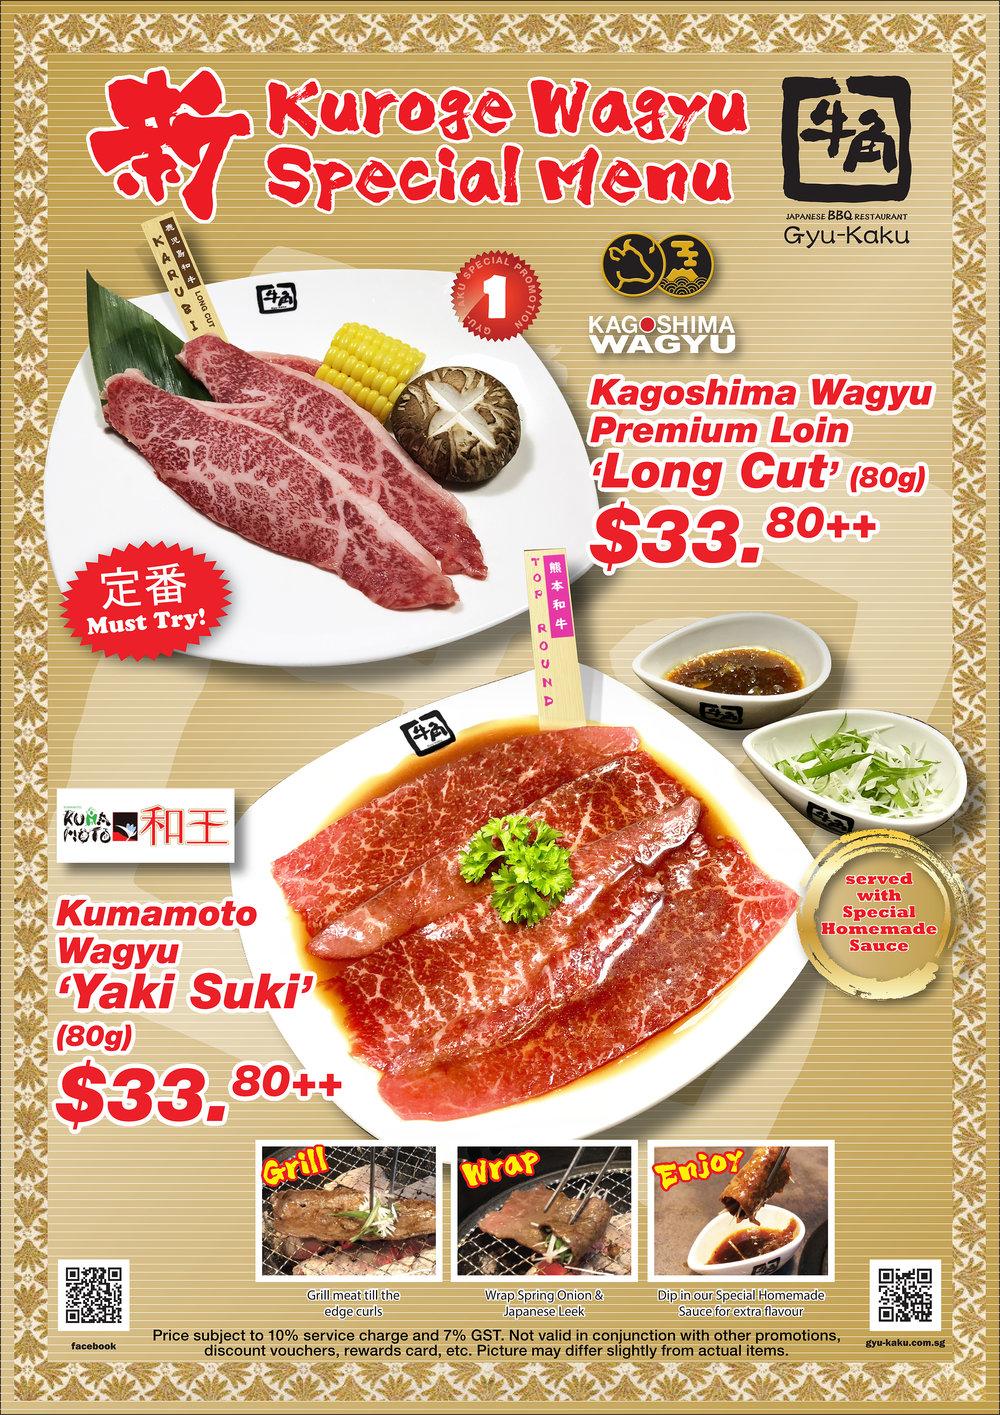 Promo_Kuroge_Wagyu_Special_Menu.jpg